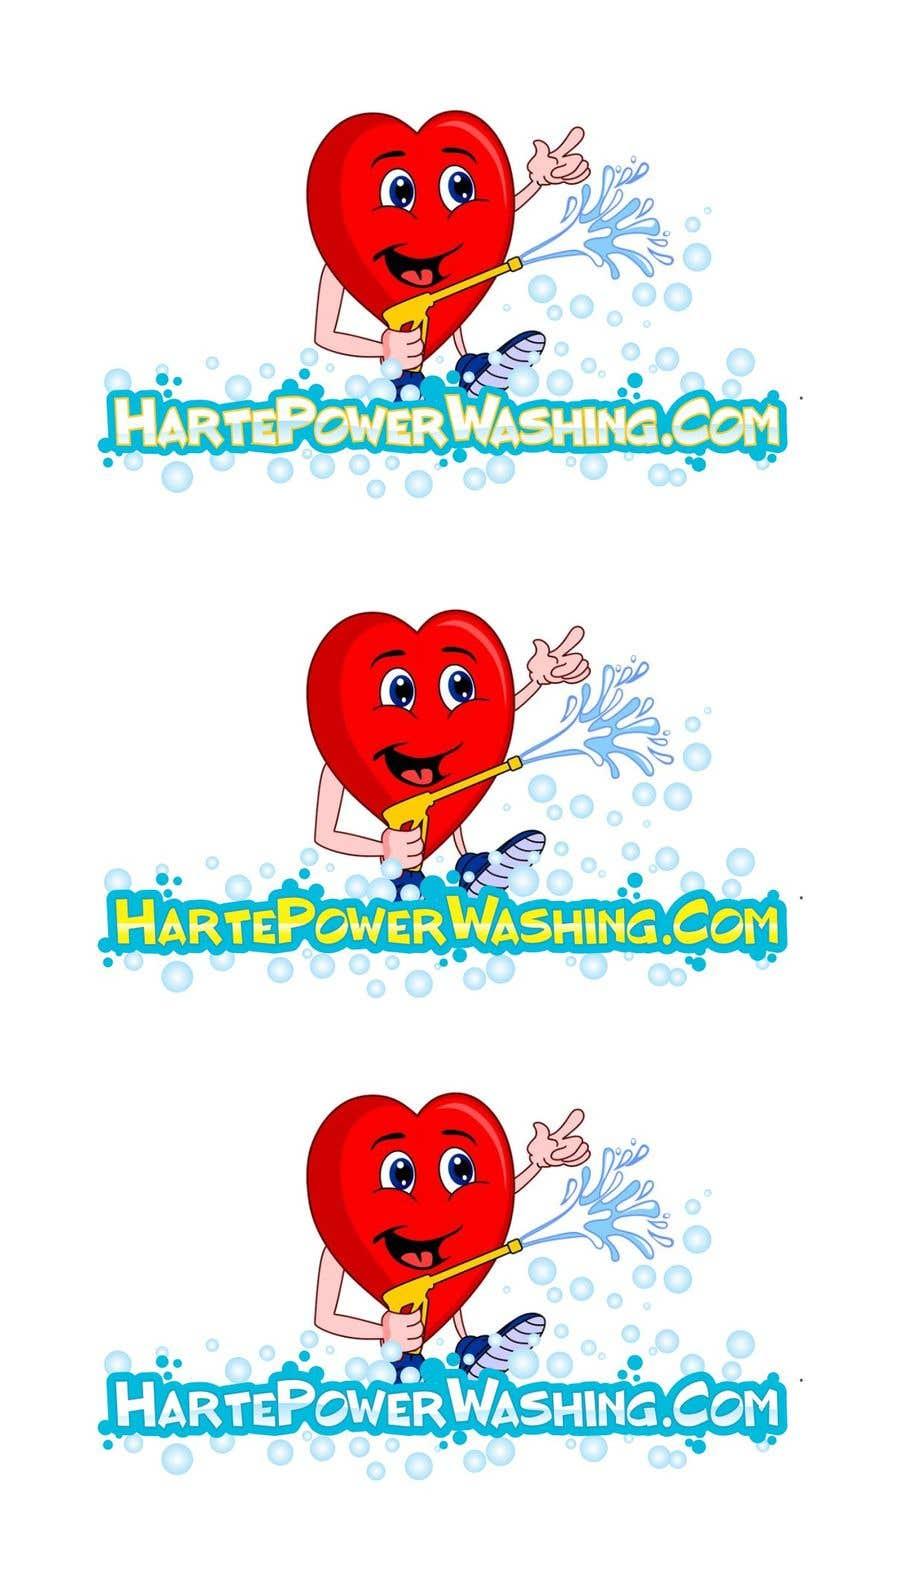 Penyertaan Peraduan #54 untuk Edit Logo Image to Add Web Address in Bubbles Graphic